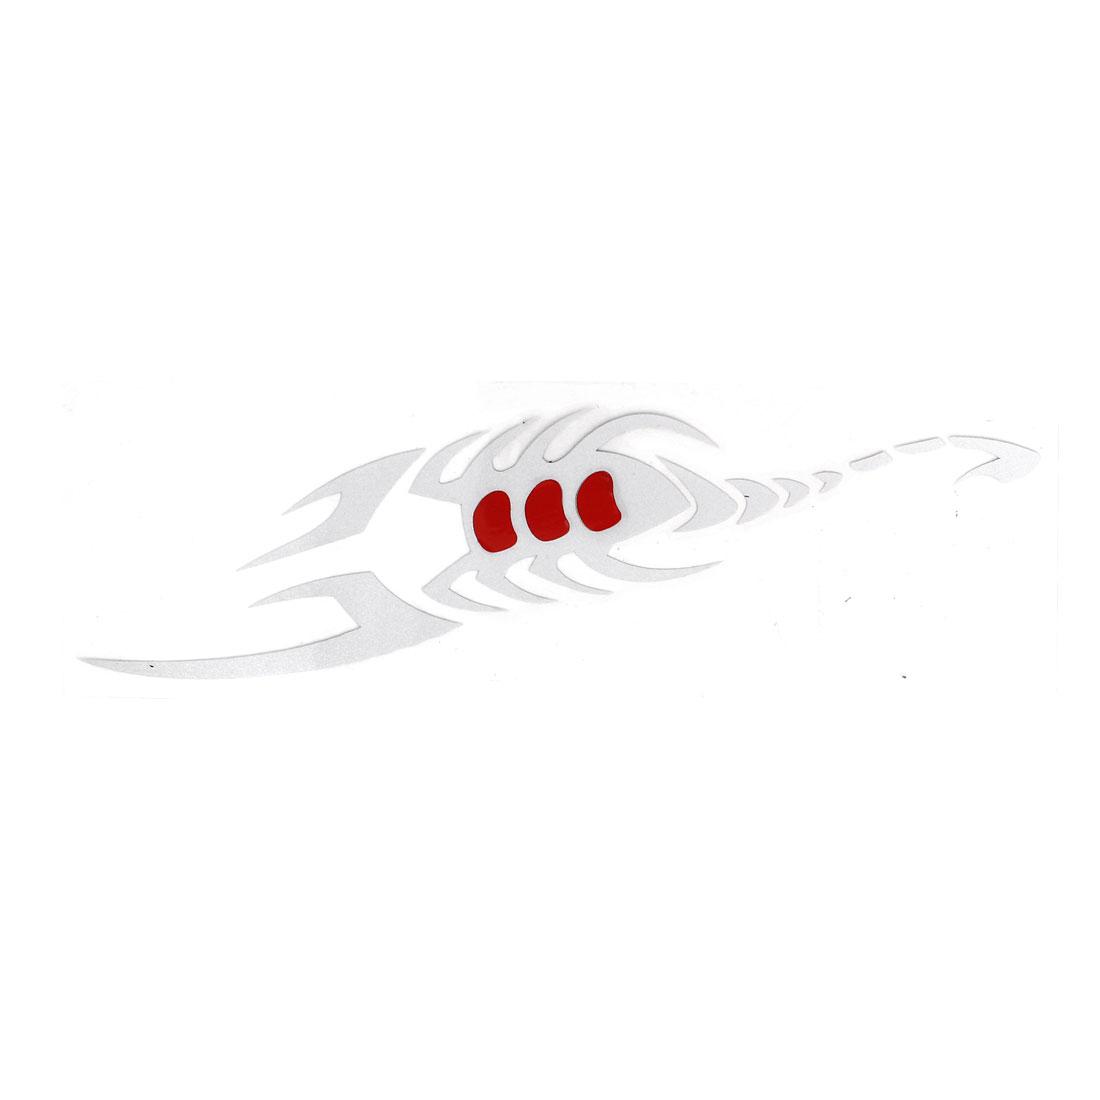 White Scorpion Design Self Adhesive Car Truck Auto Window Stickers Decal Ornamnet